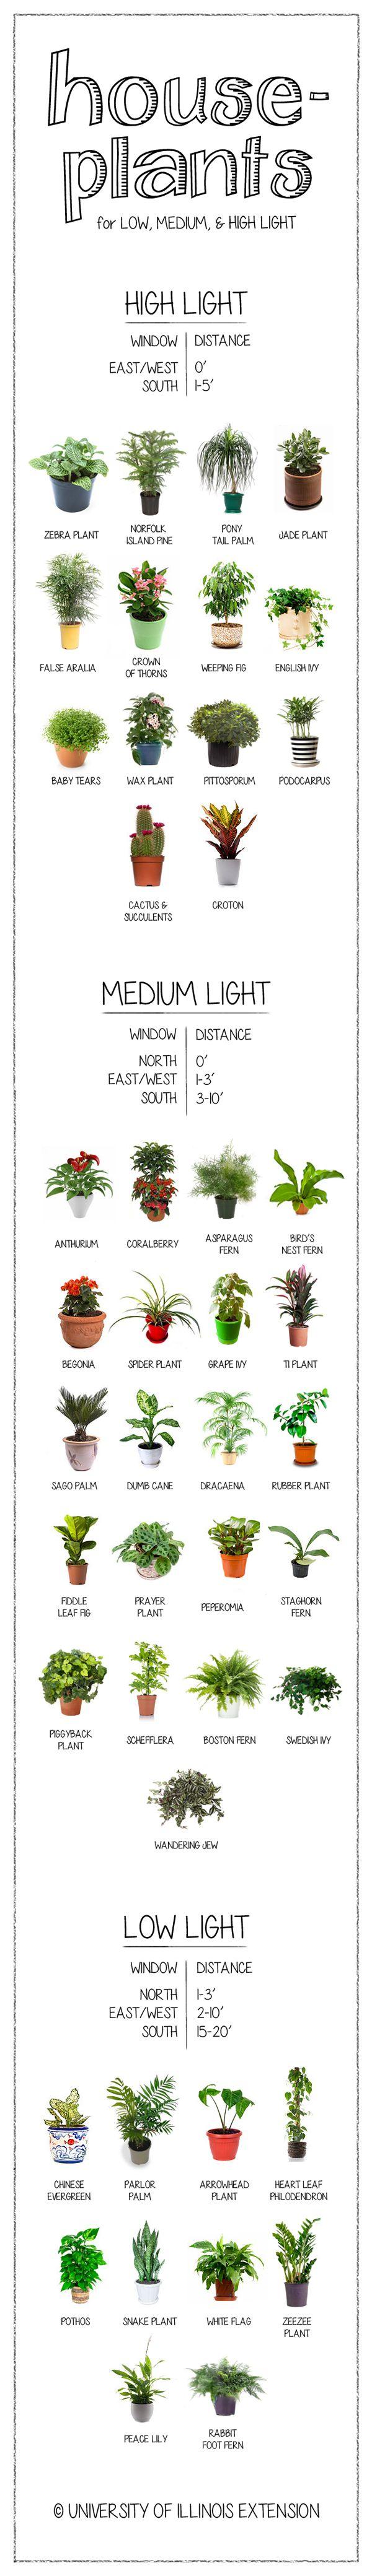 Houseplants for Low, Medium, & Bright Light